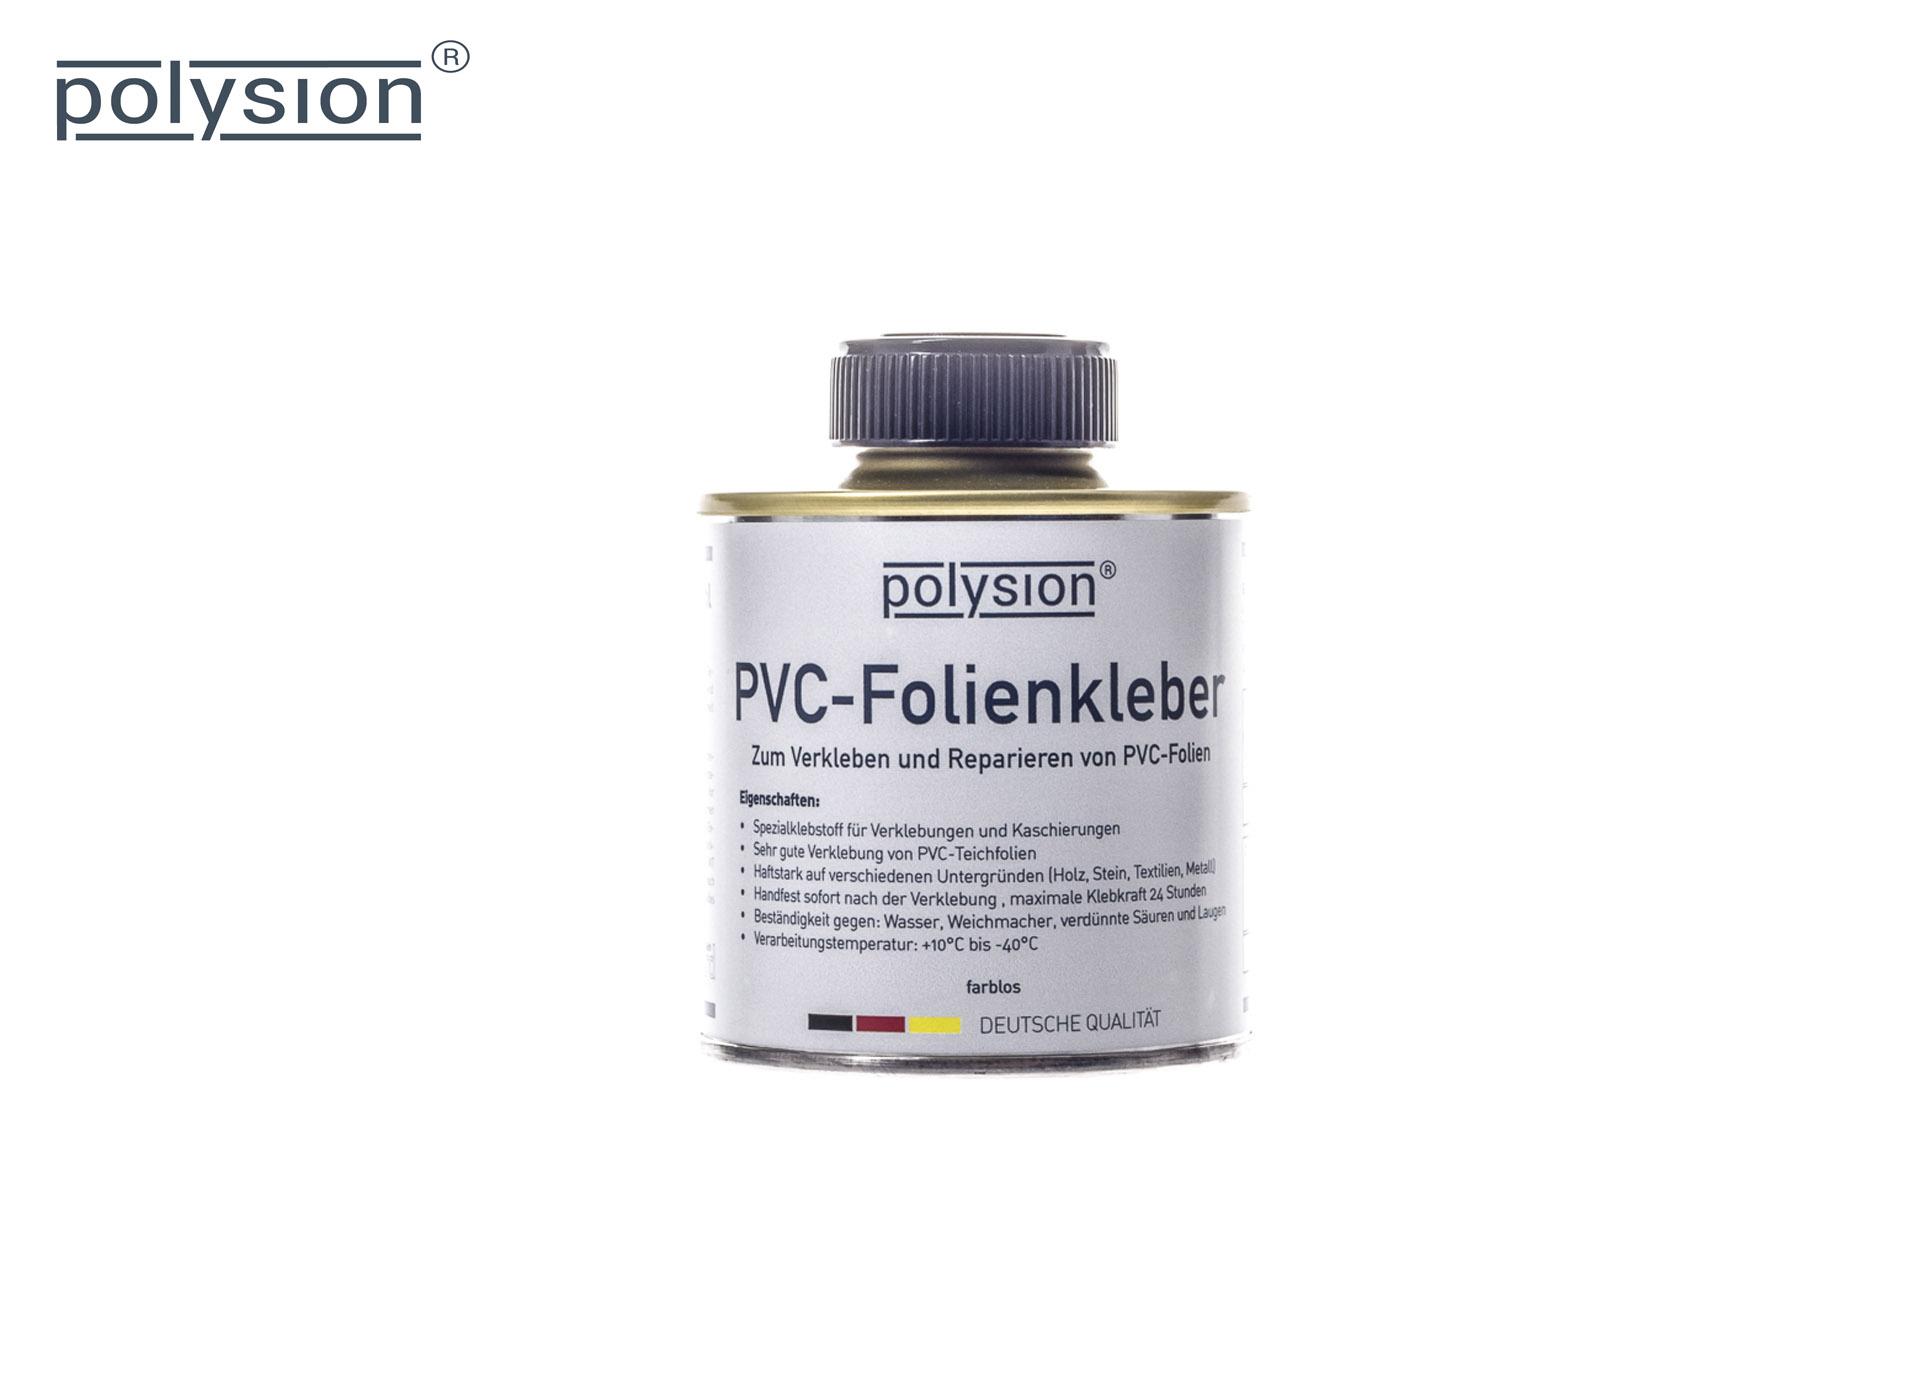 Polysion®PVC-Teichfolienkleber, 200ml - Grundpreis: 5,45€/100ml